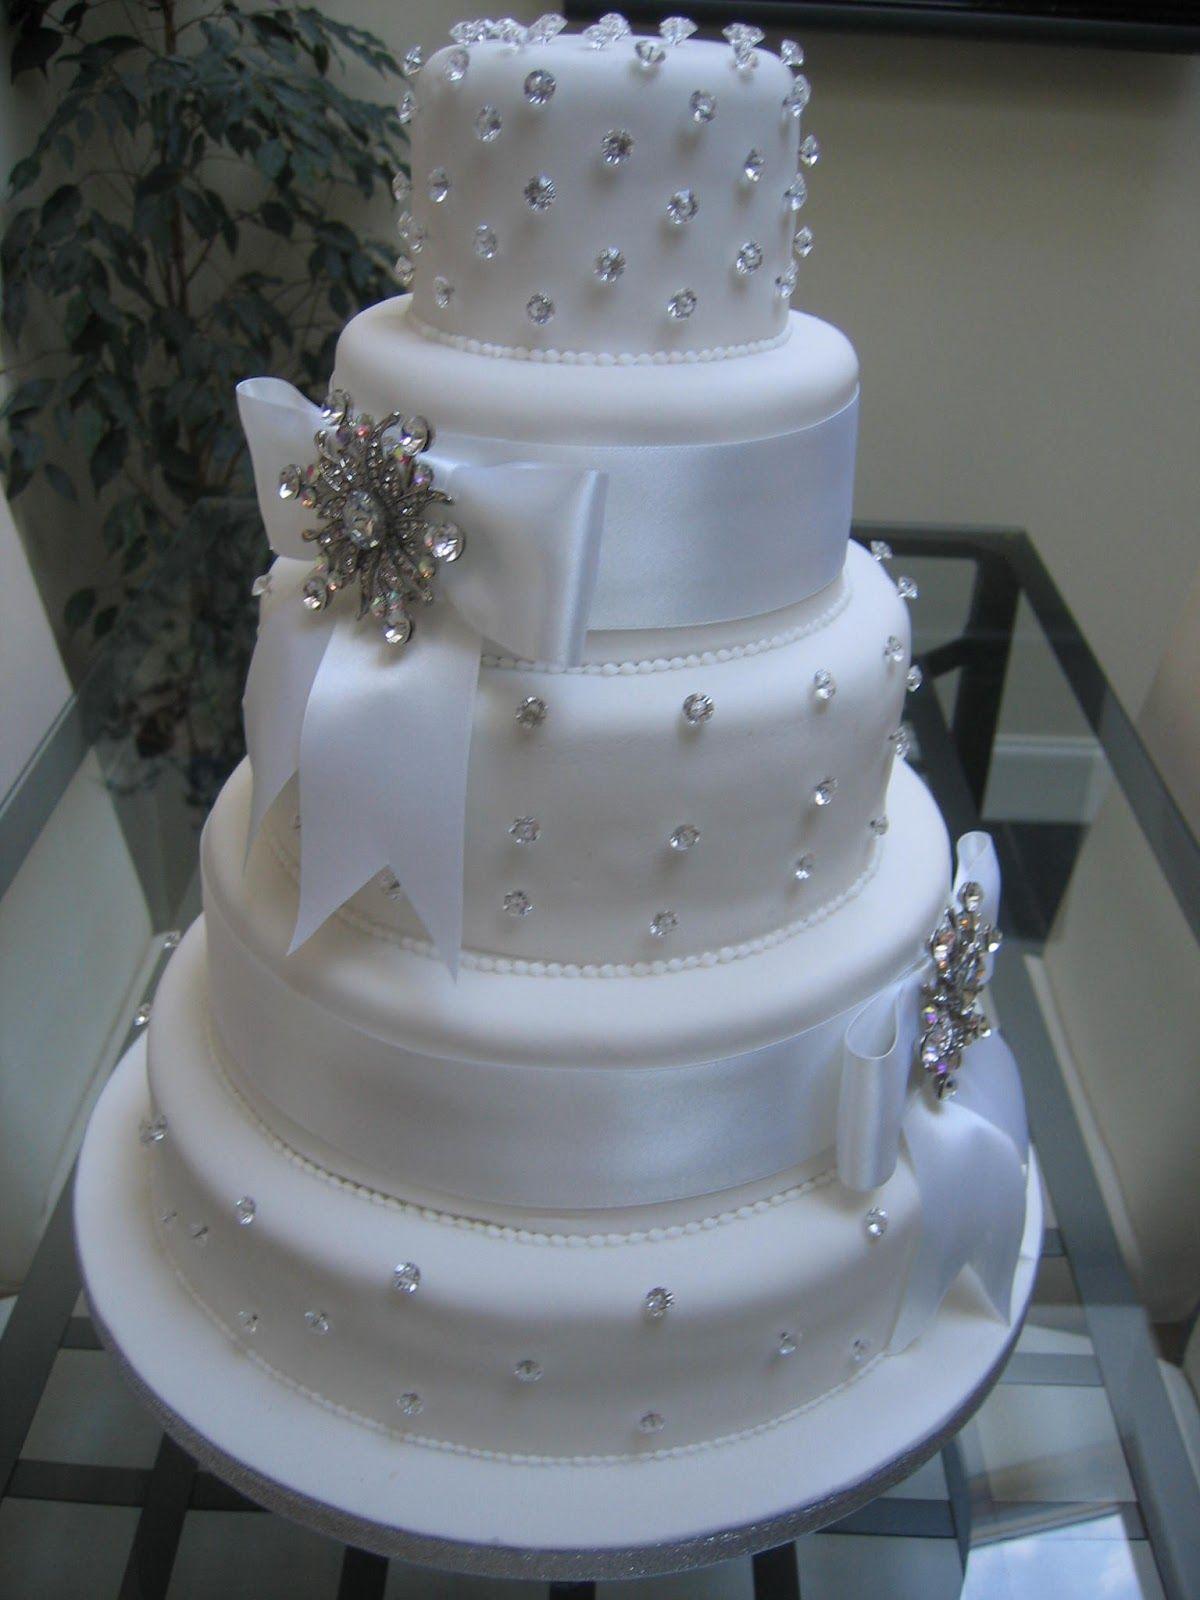 5 Tiered White Wedding Cake With Bling Bow Wedding Cake Bling Beautiful Cakes That Sparkle Shine Ideal Wedding Cake Designs Bow Wedding Cakes Bling Cakes